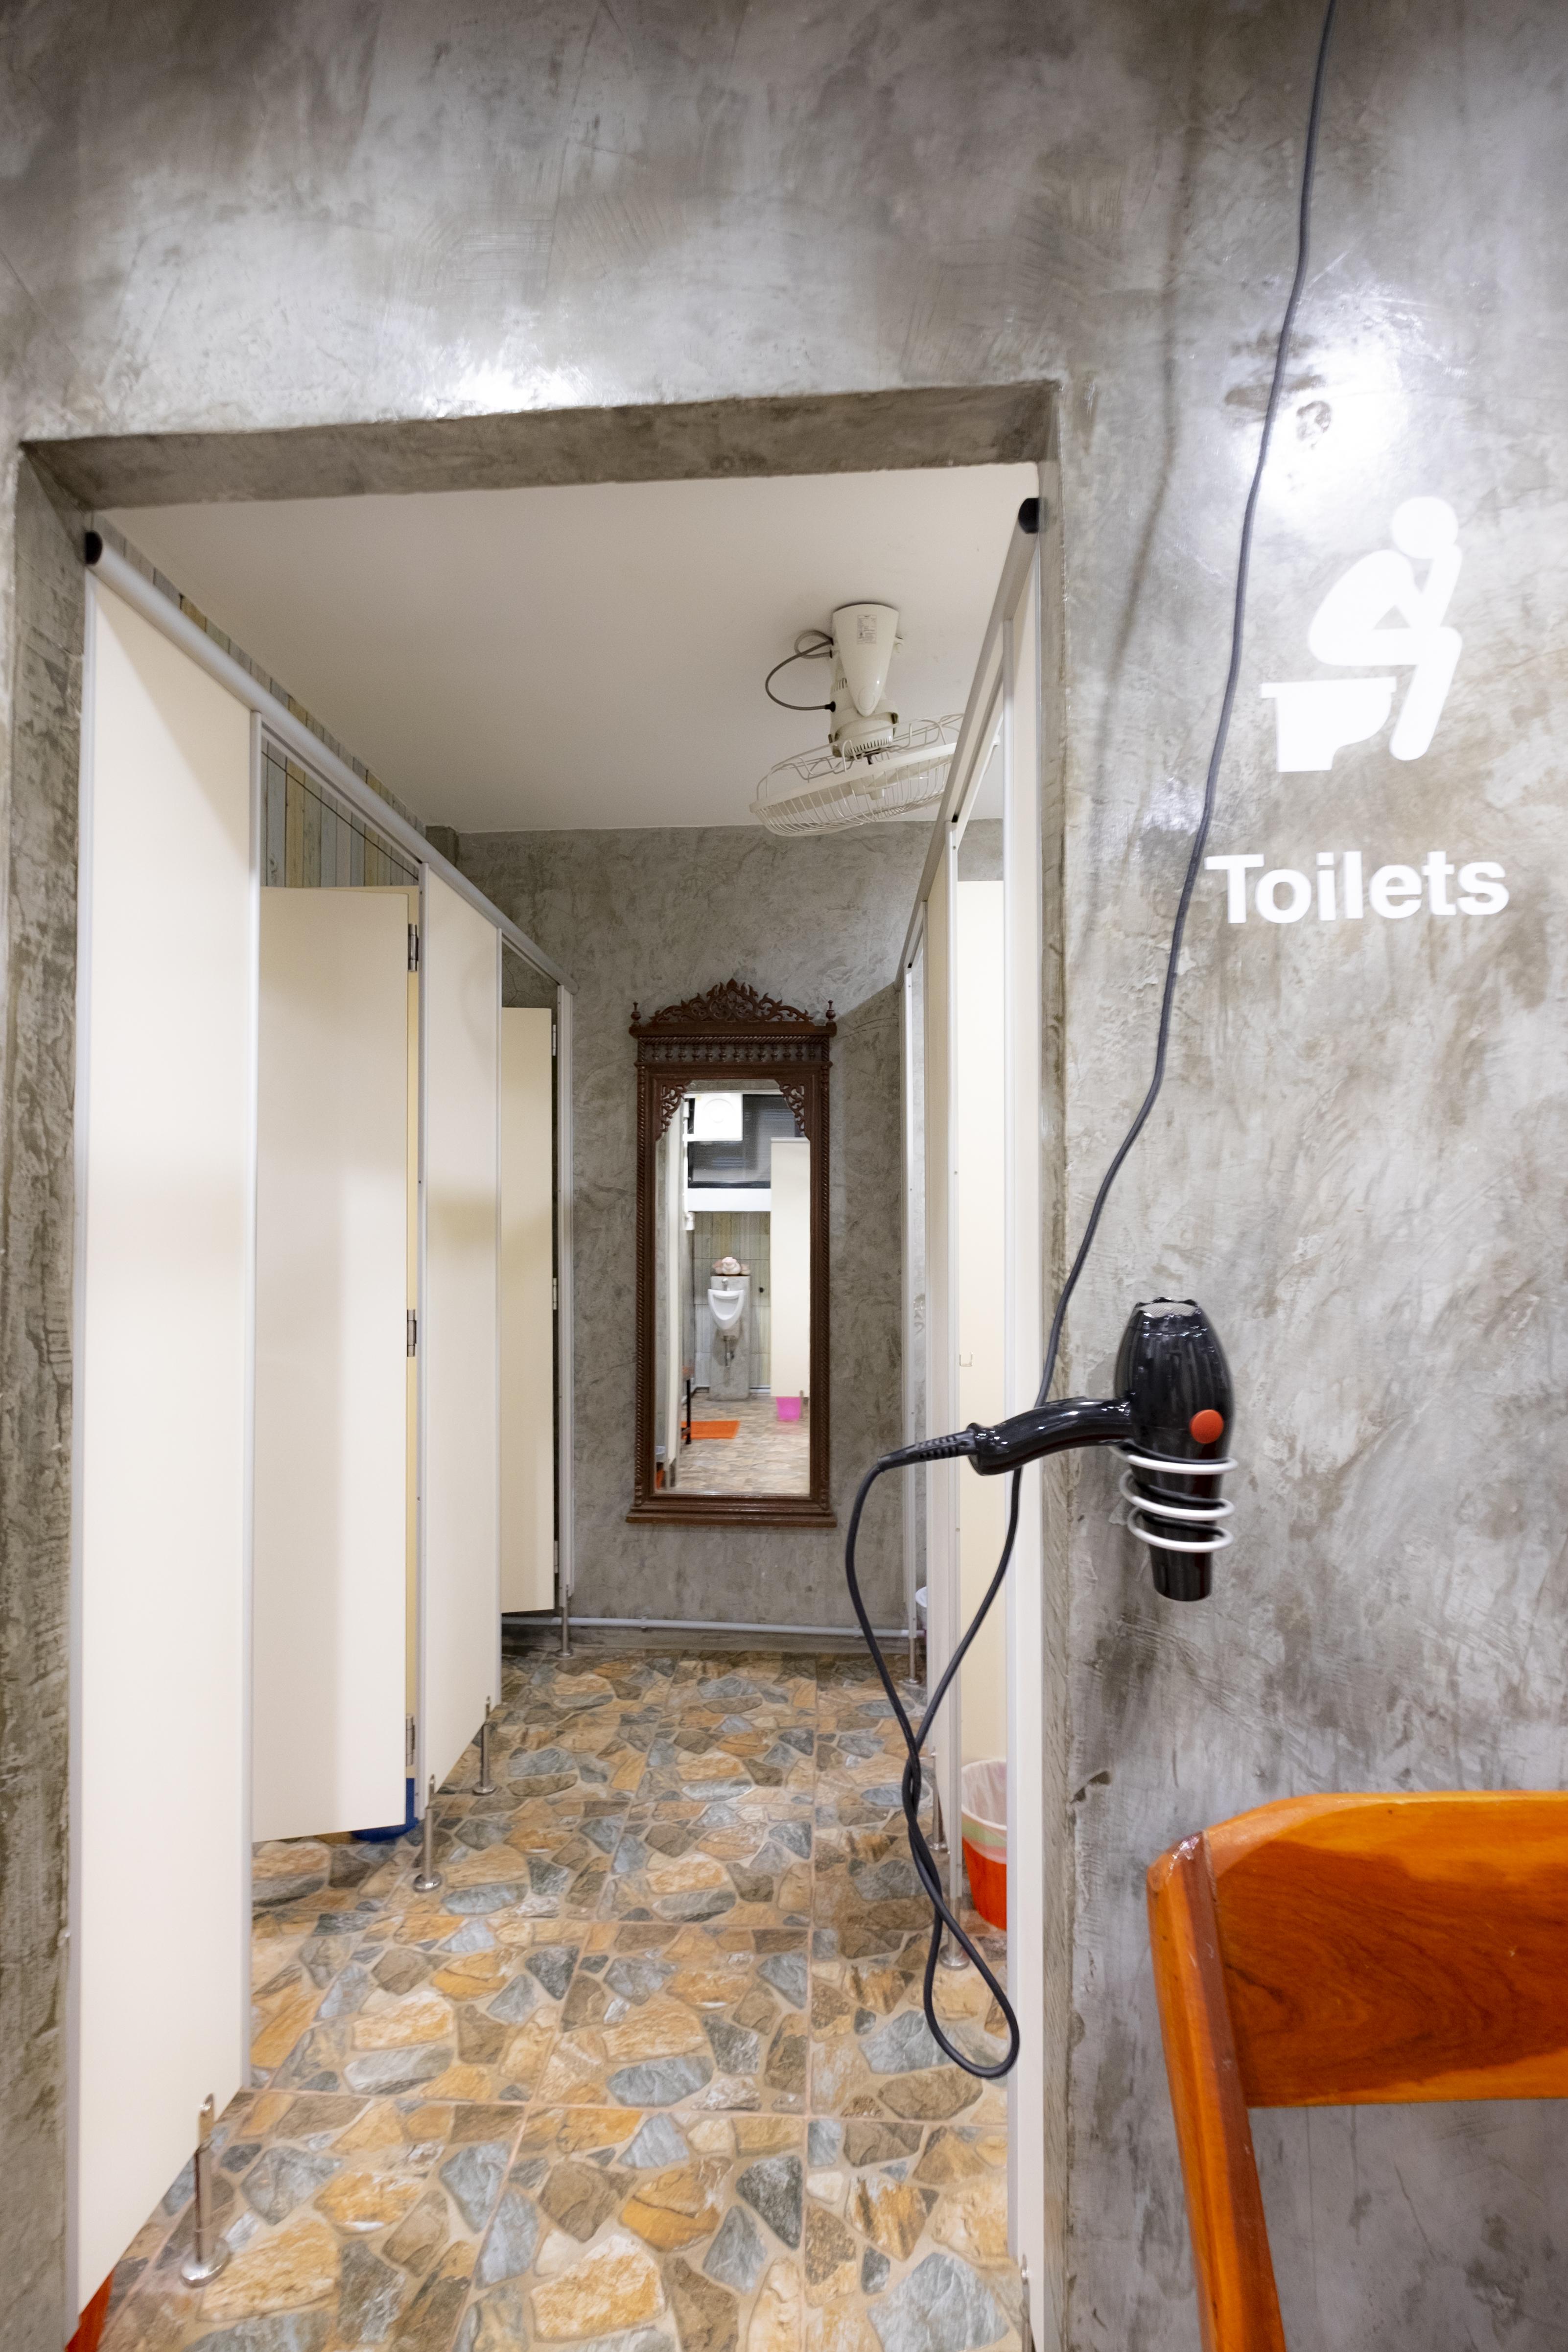 HOSTEL - Check-in My Hostel